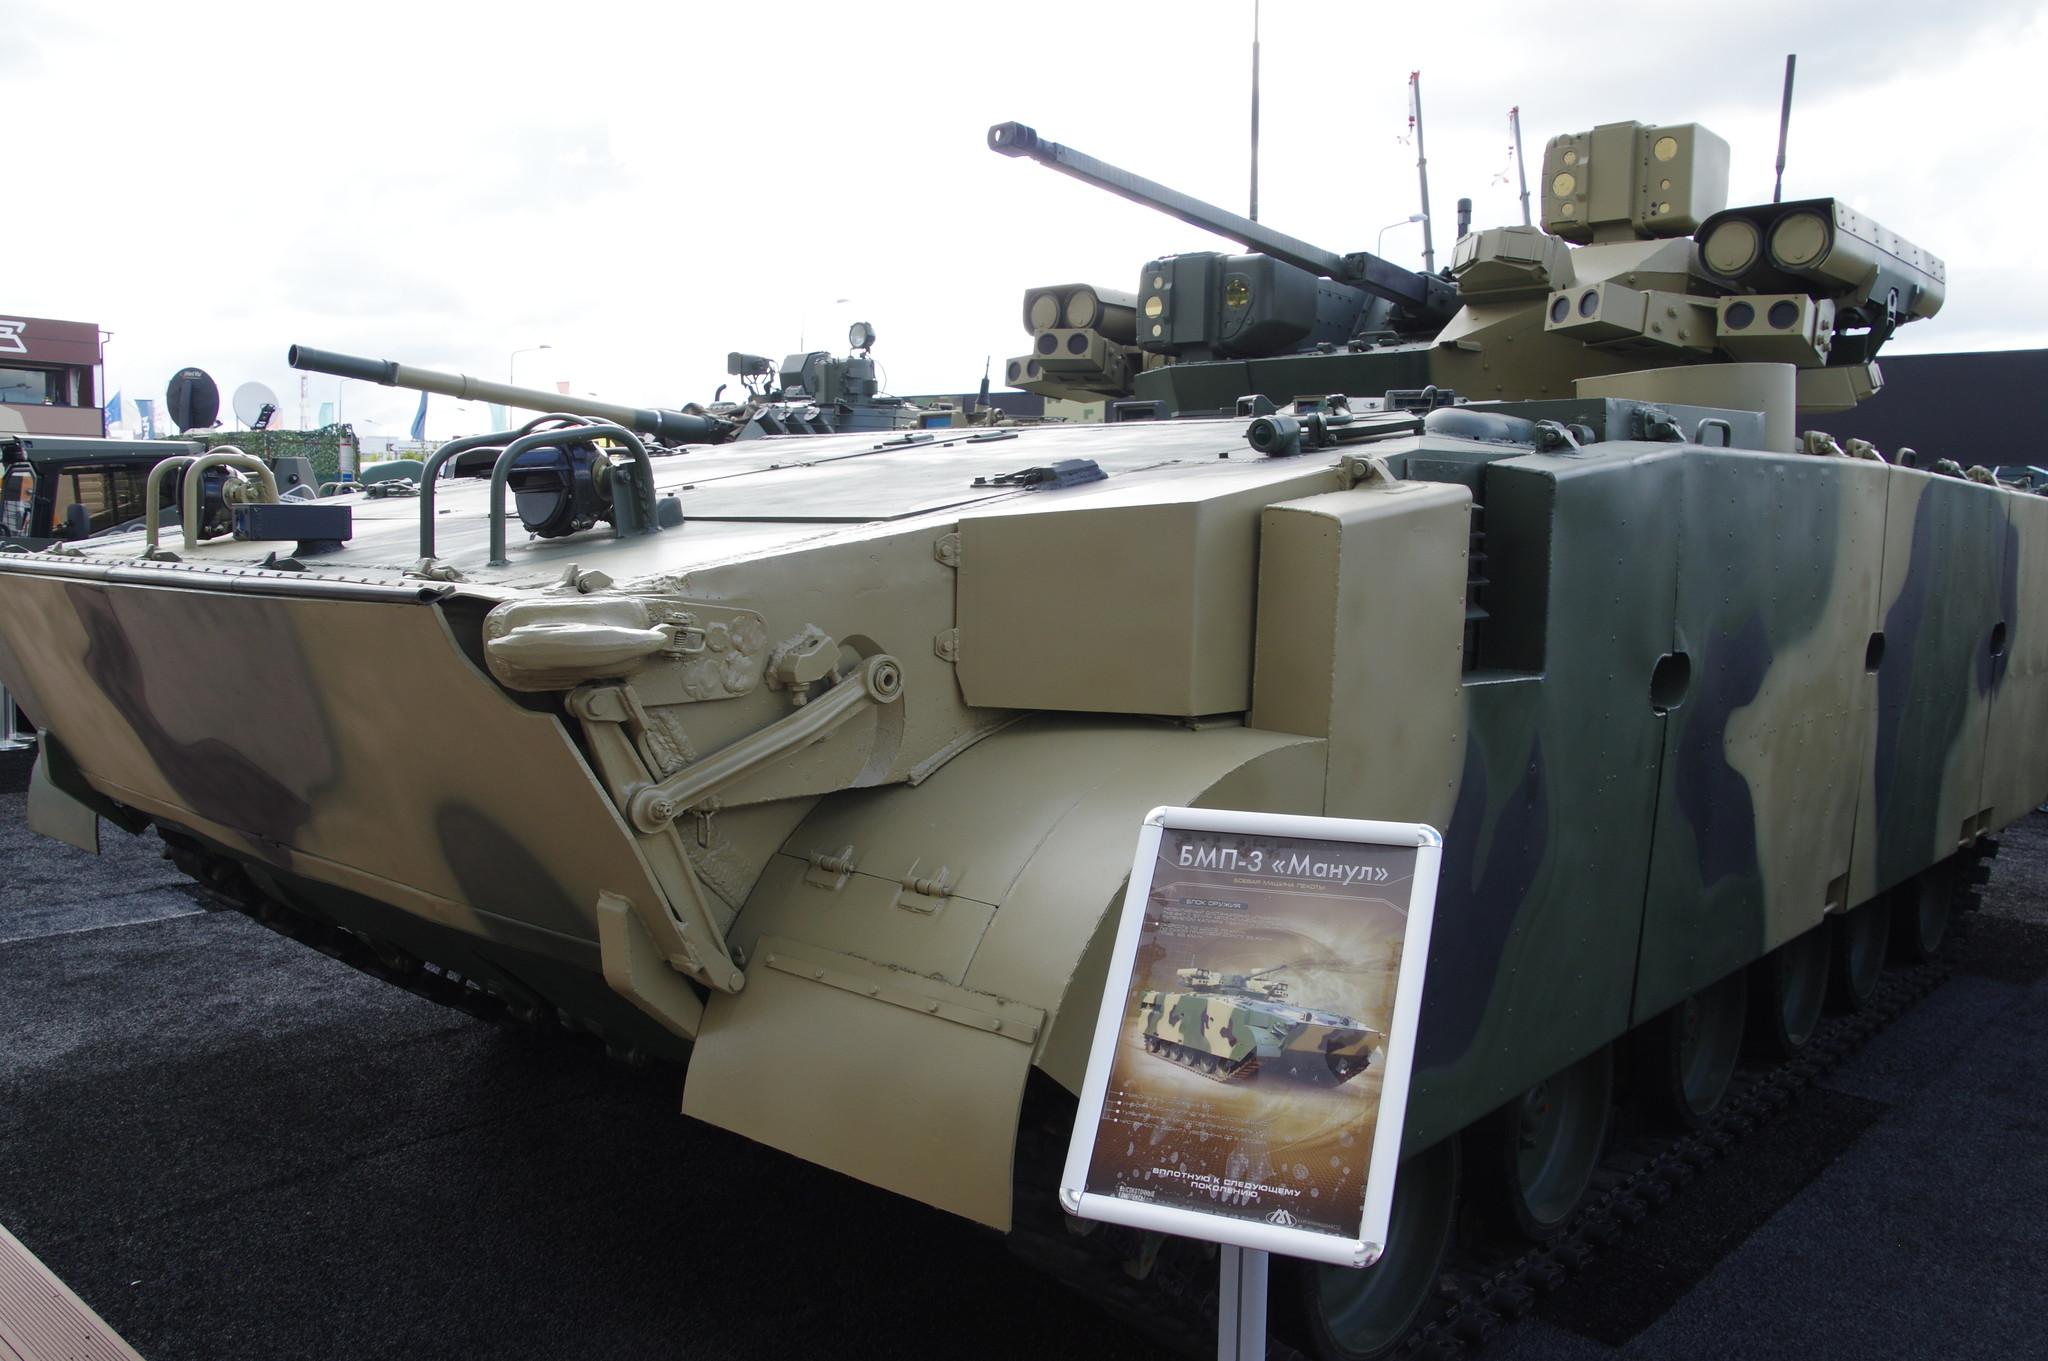 Боевая машина пехоты БМП-3 «Манул»